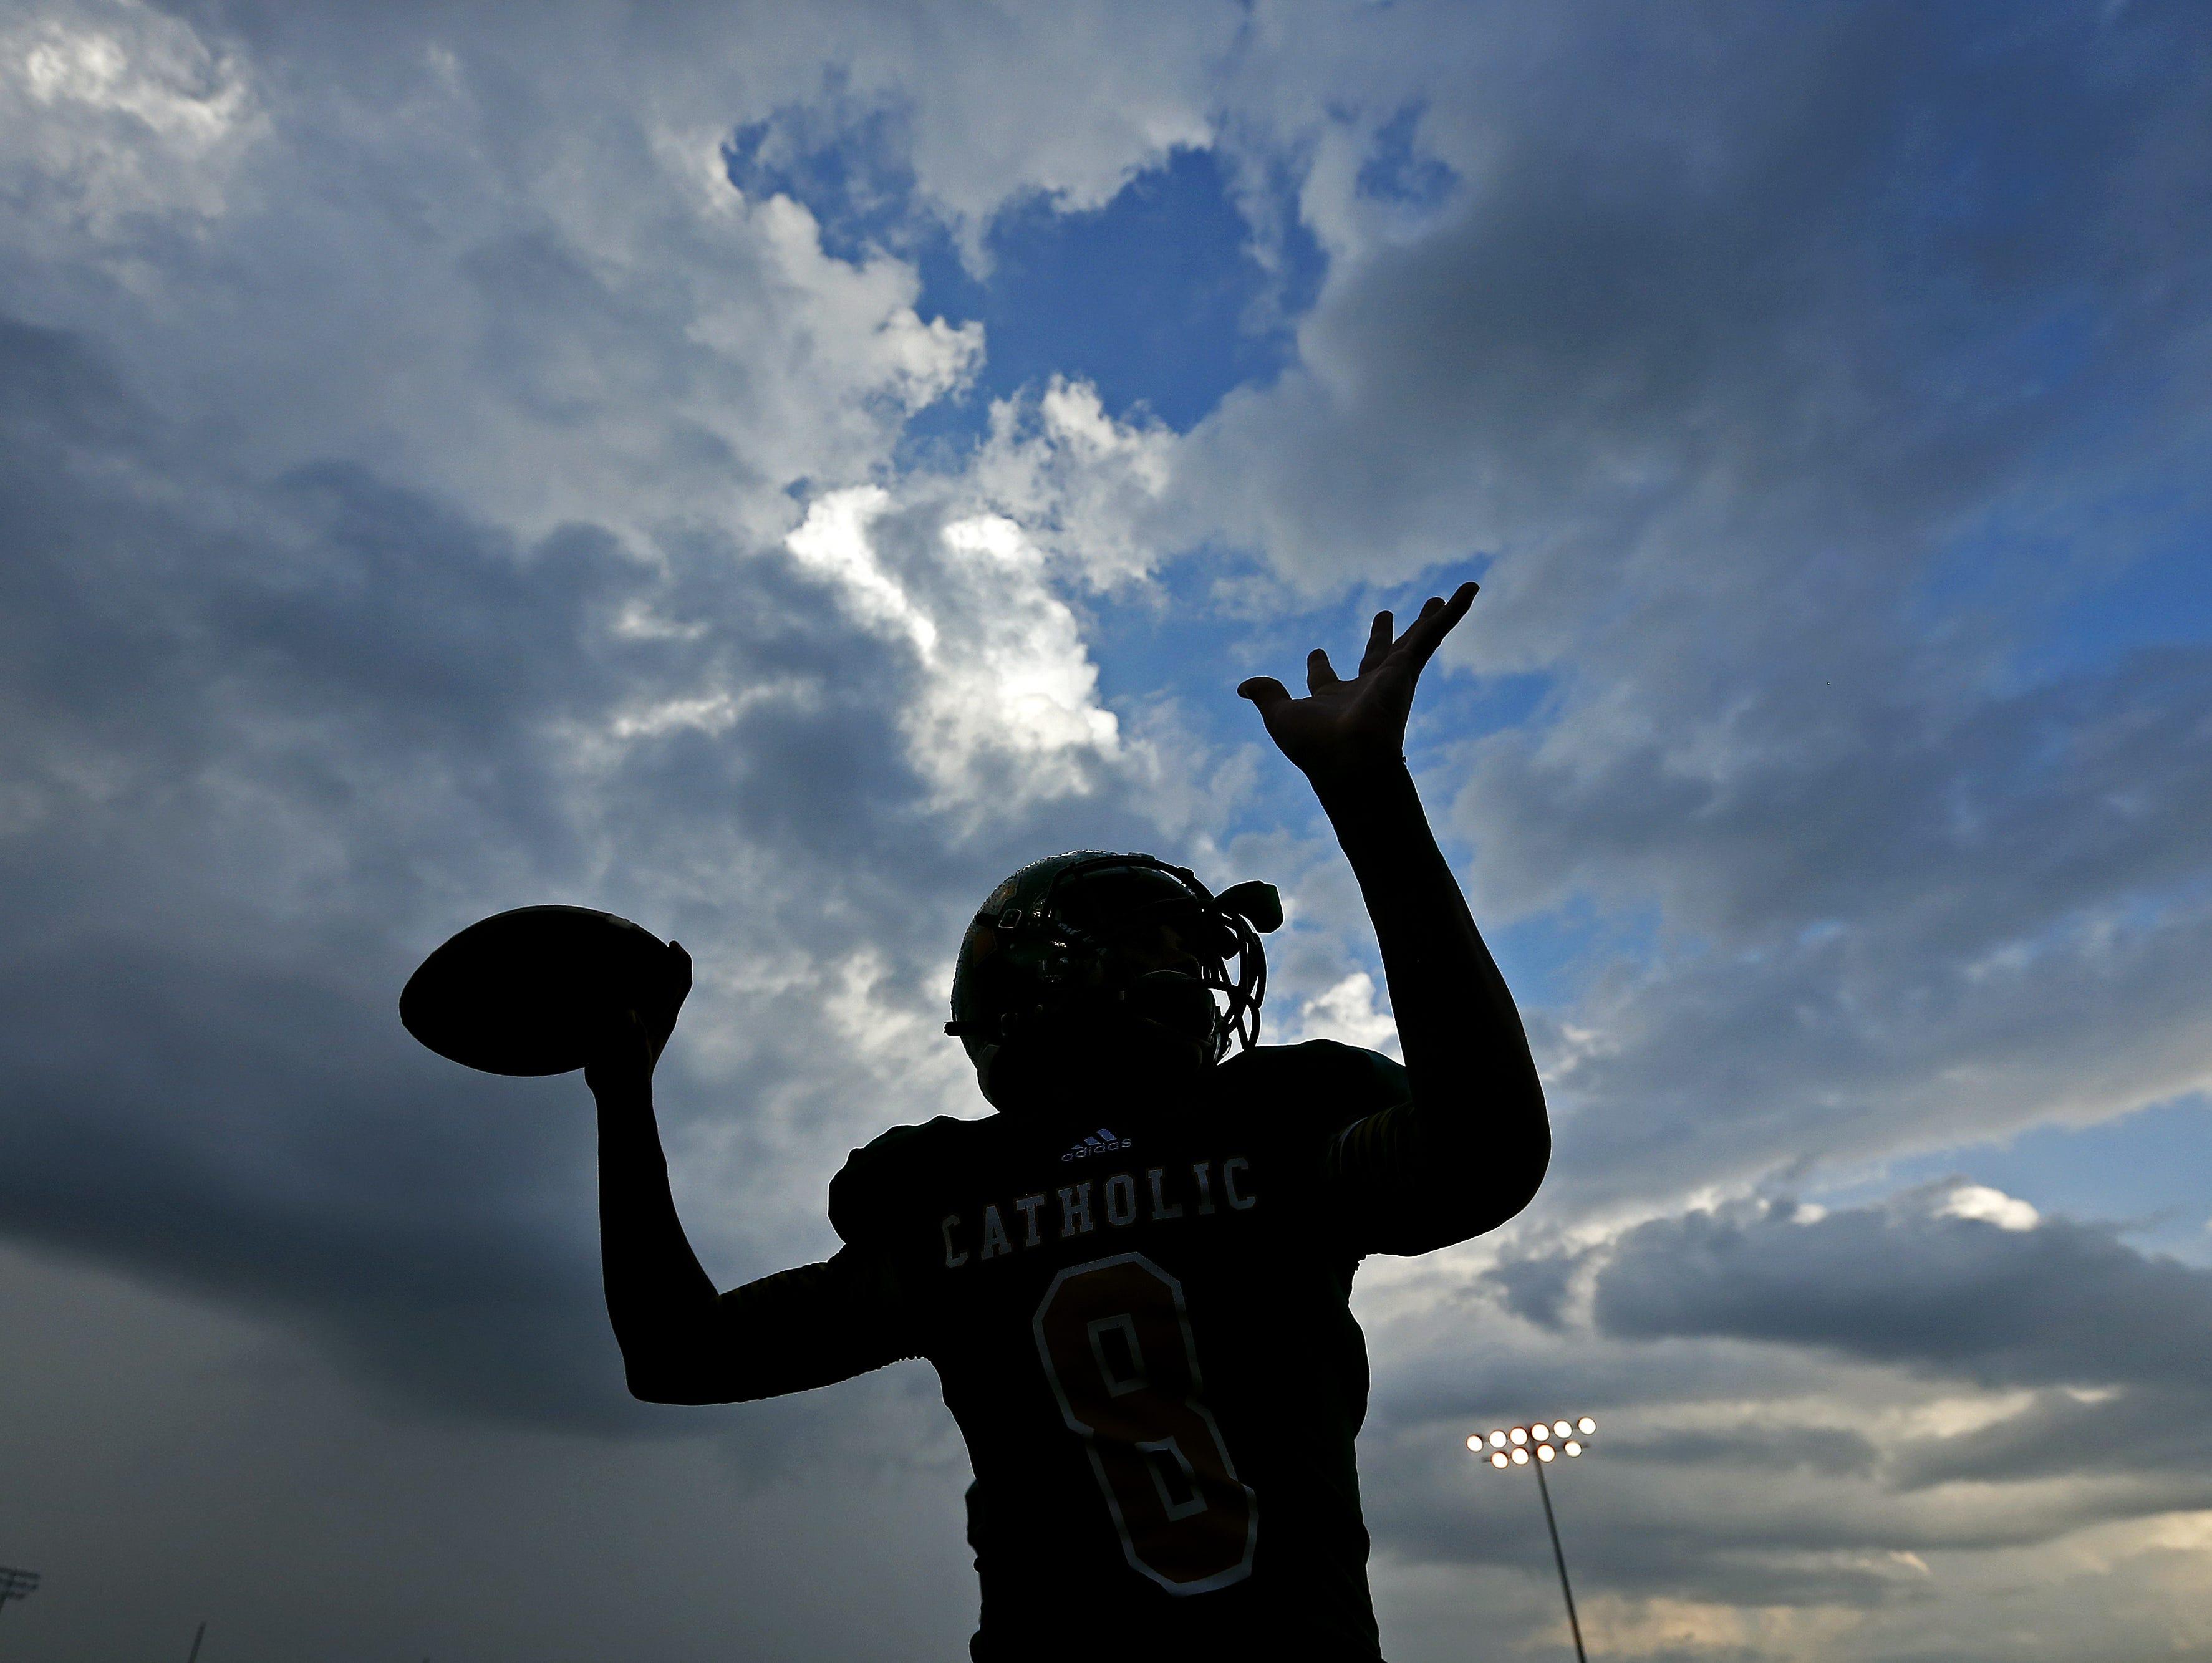 Springfield Catholic quarterback Tyson Riley (8) warms up prior to a 2016 game.